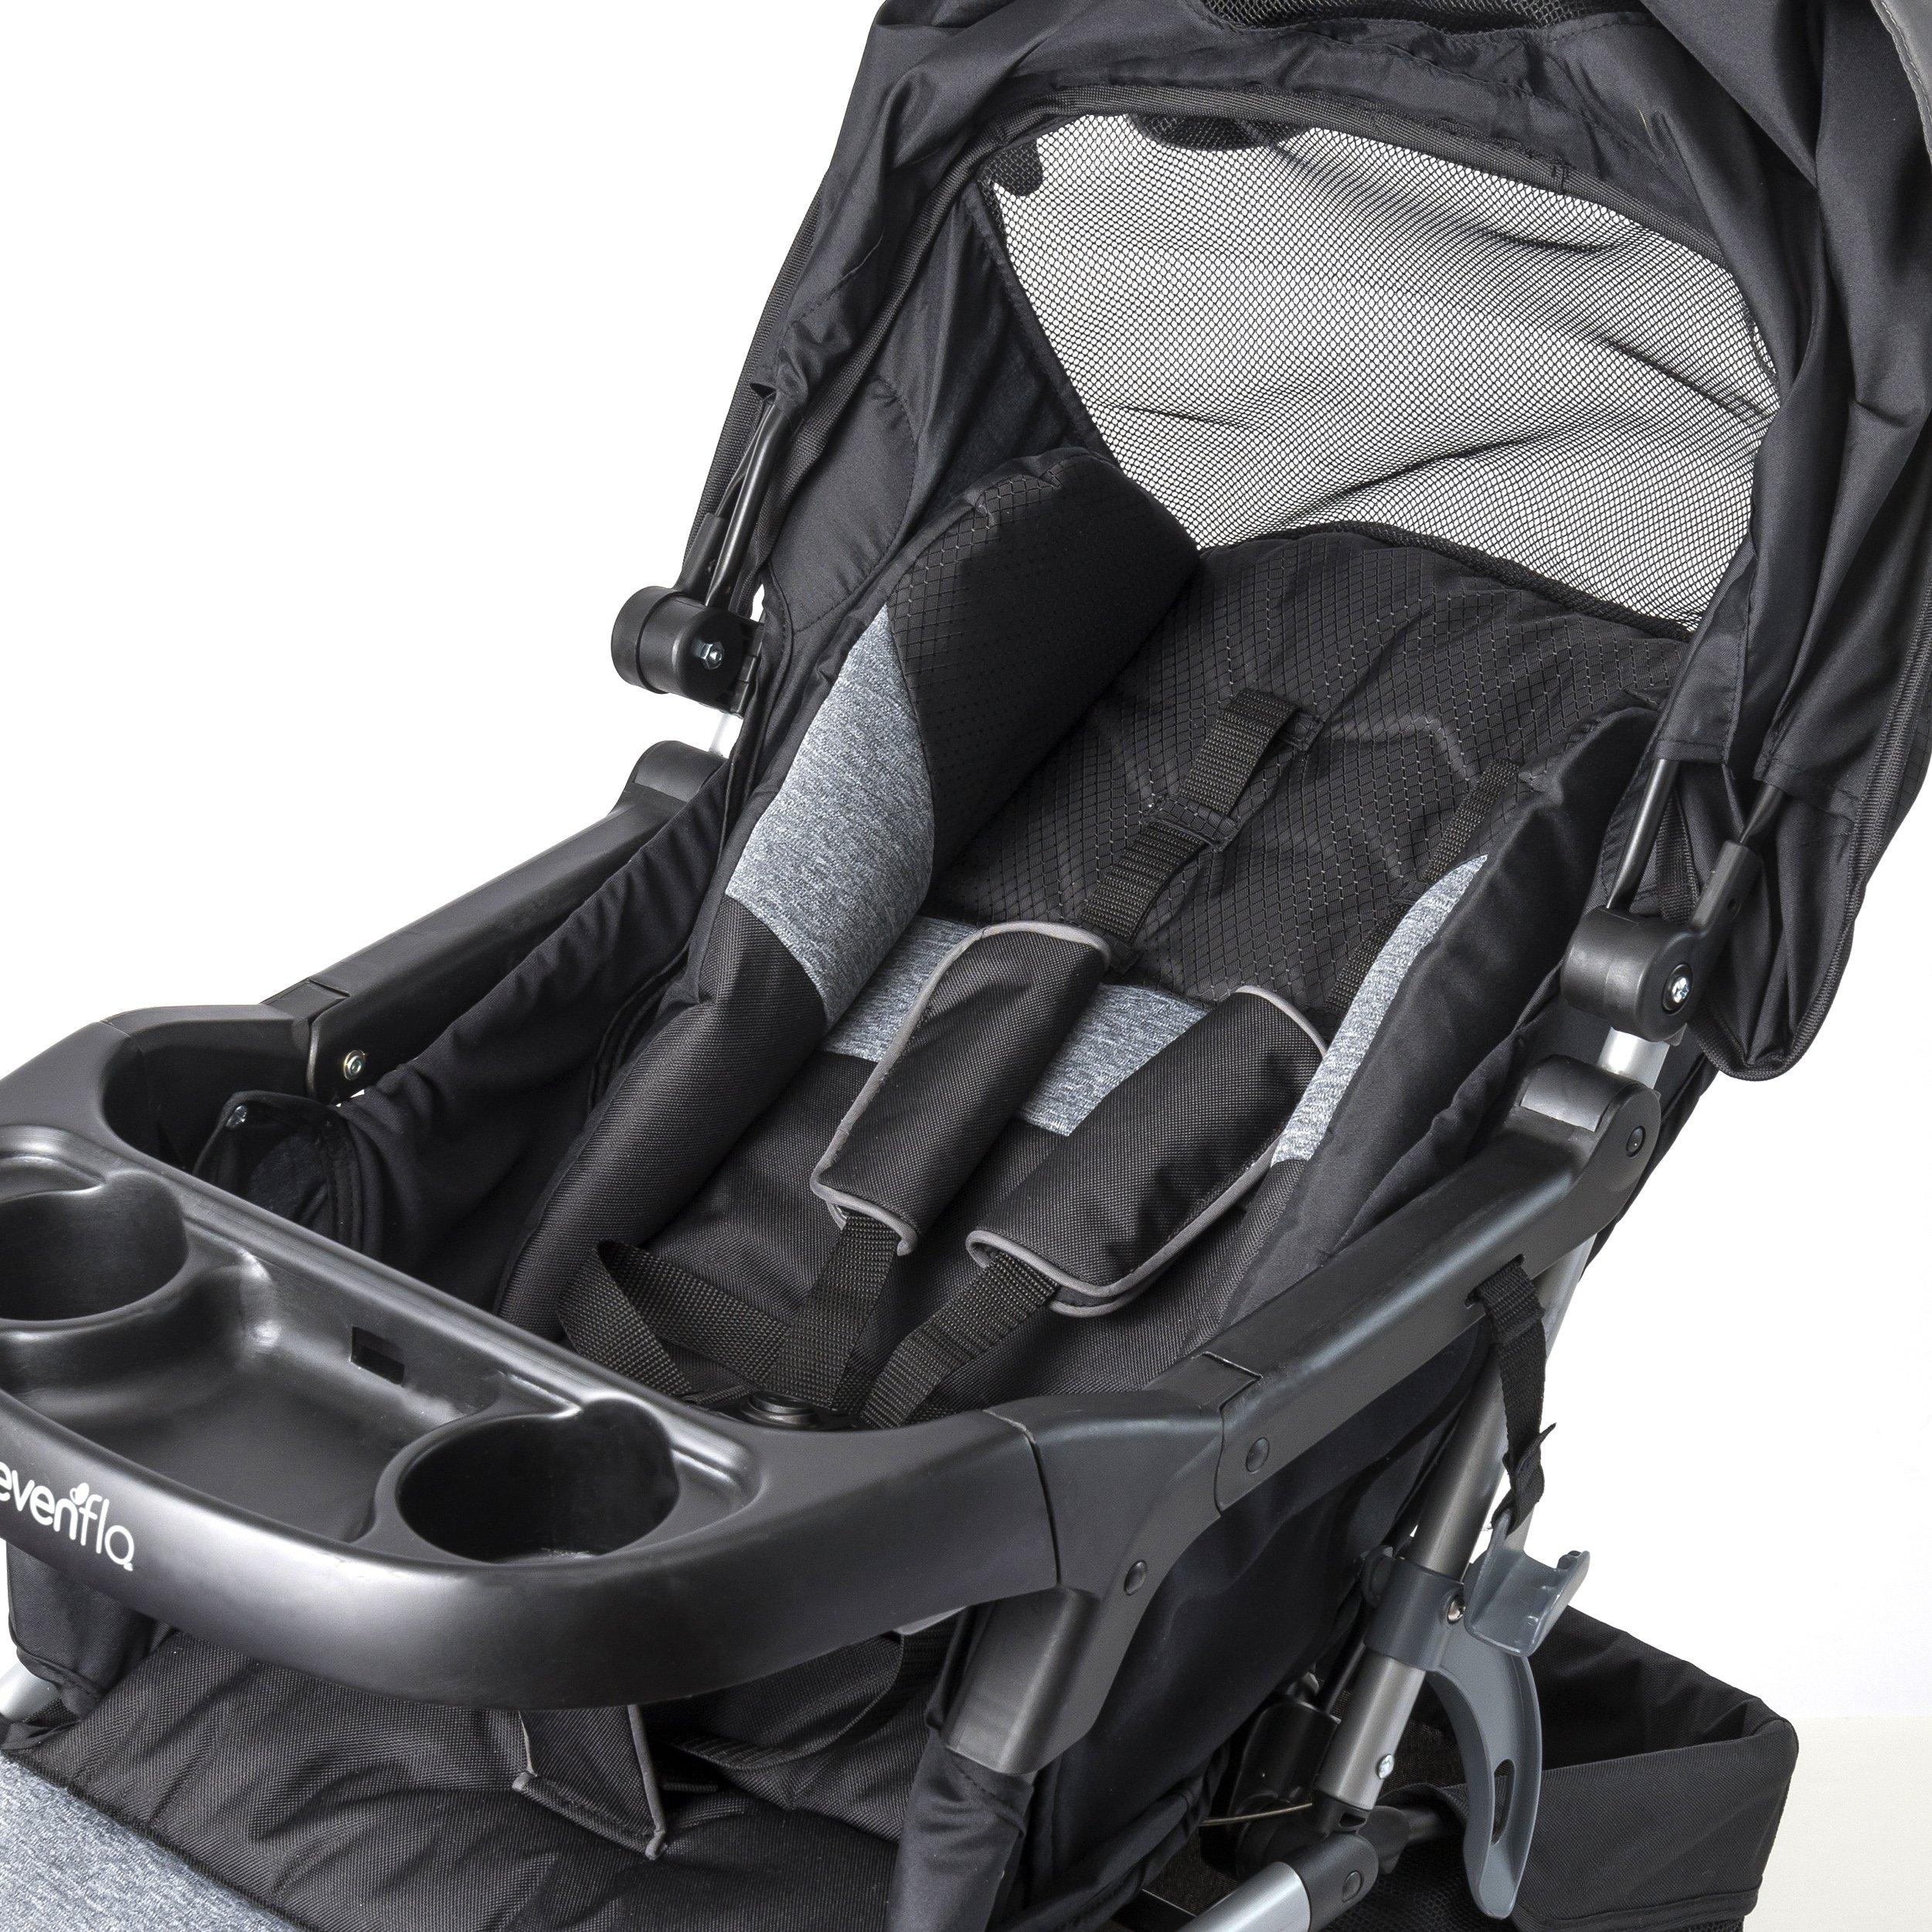 Evenflo Advanced SensorSafe Epic Travel System with LiteMax Infant Car Seat, Jet by Evenflo (Image #7)